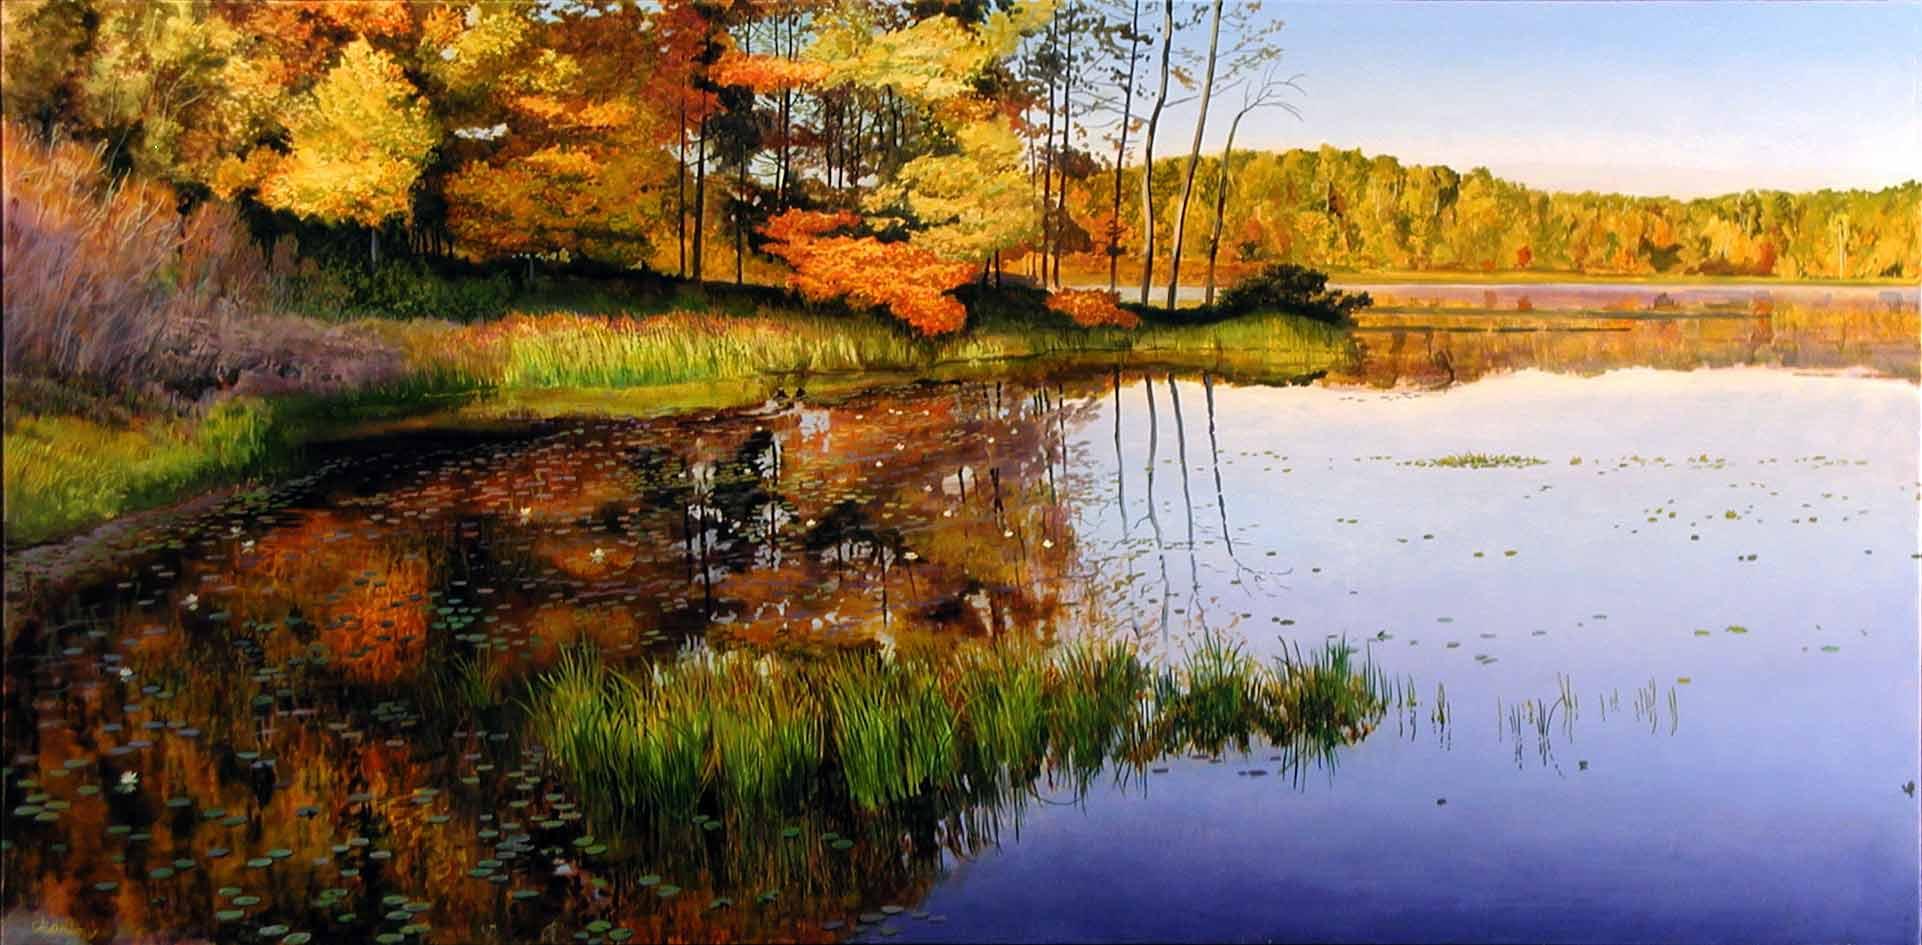 Wildwing Озера в районе Кенсингтон Metropark